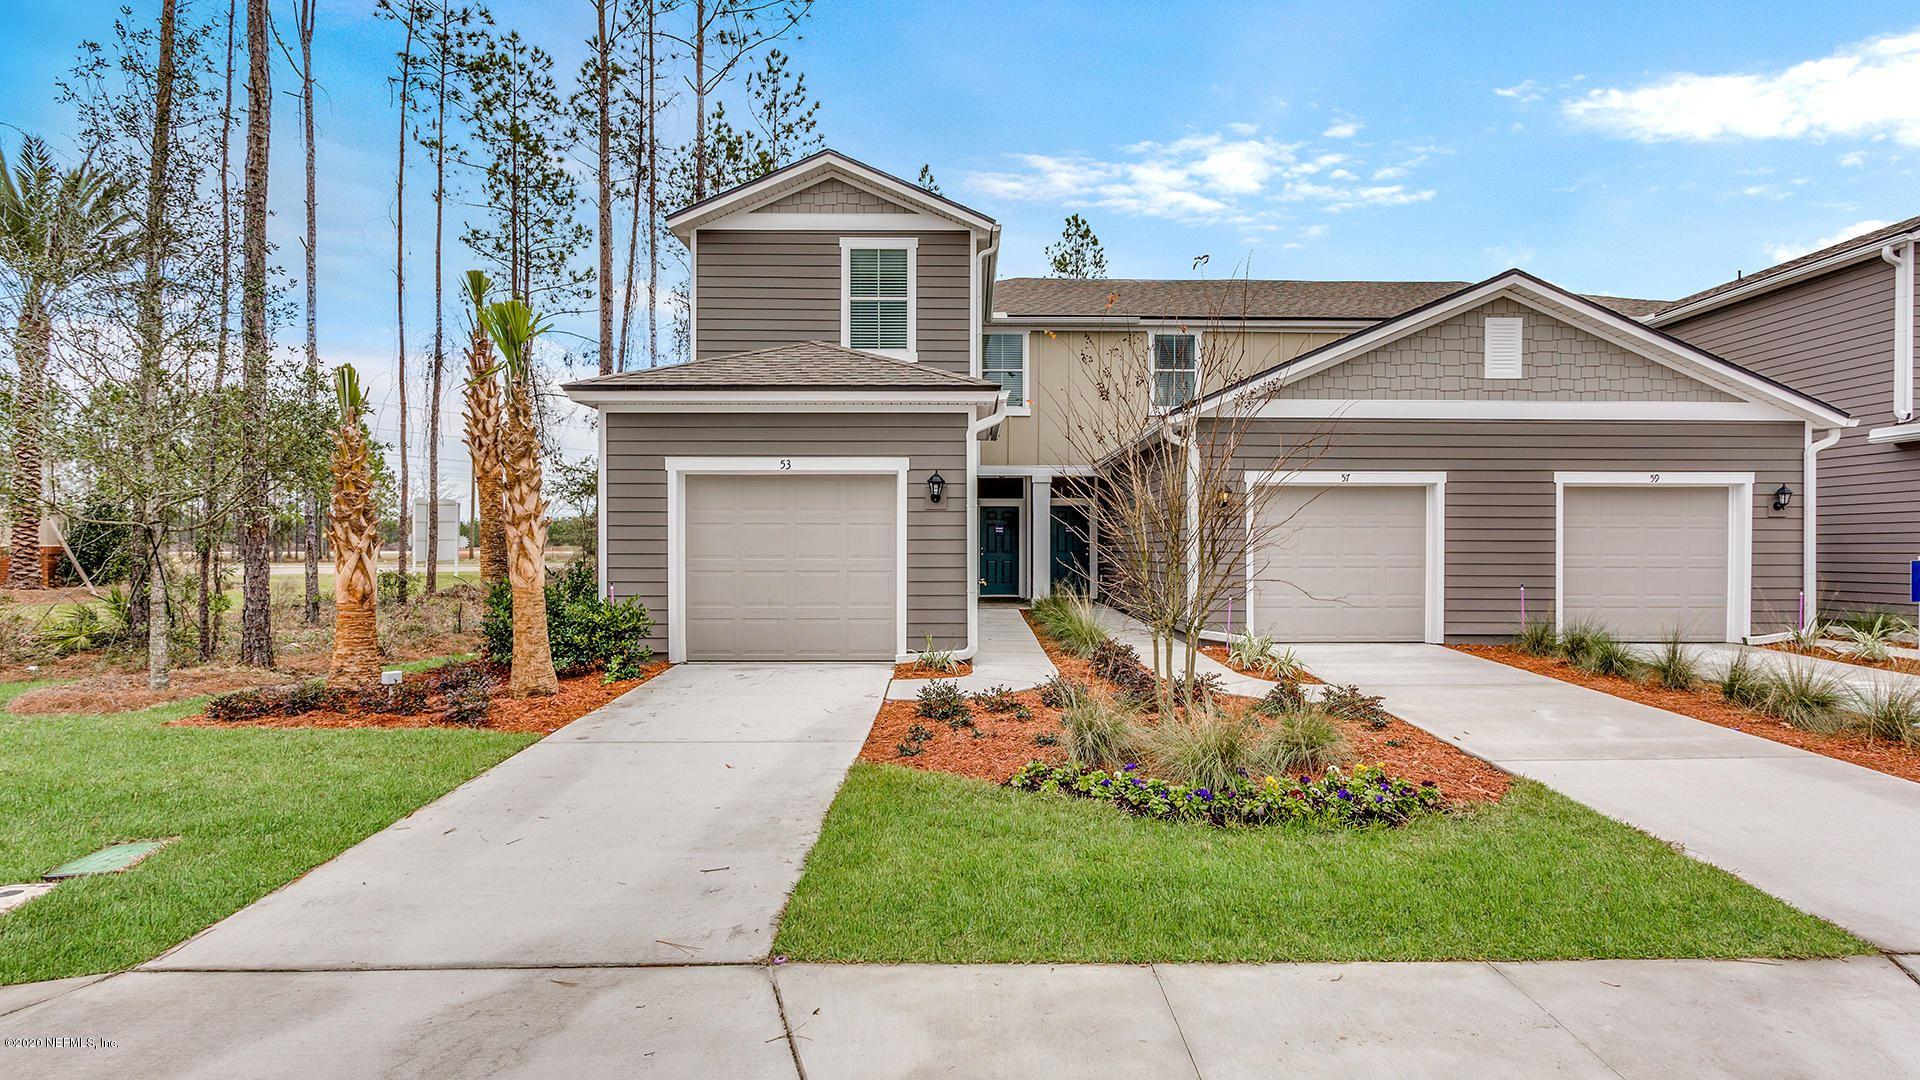 400 ARALIA LN #Lot No: 97, Jacksonville, FL 32216 - MLS#: 1086233